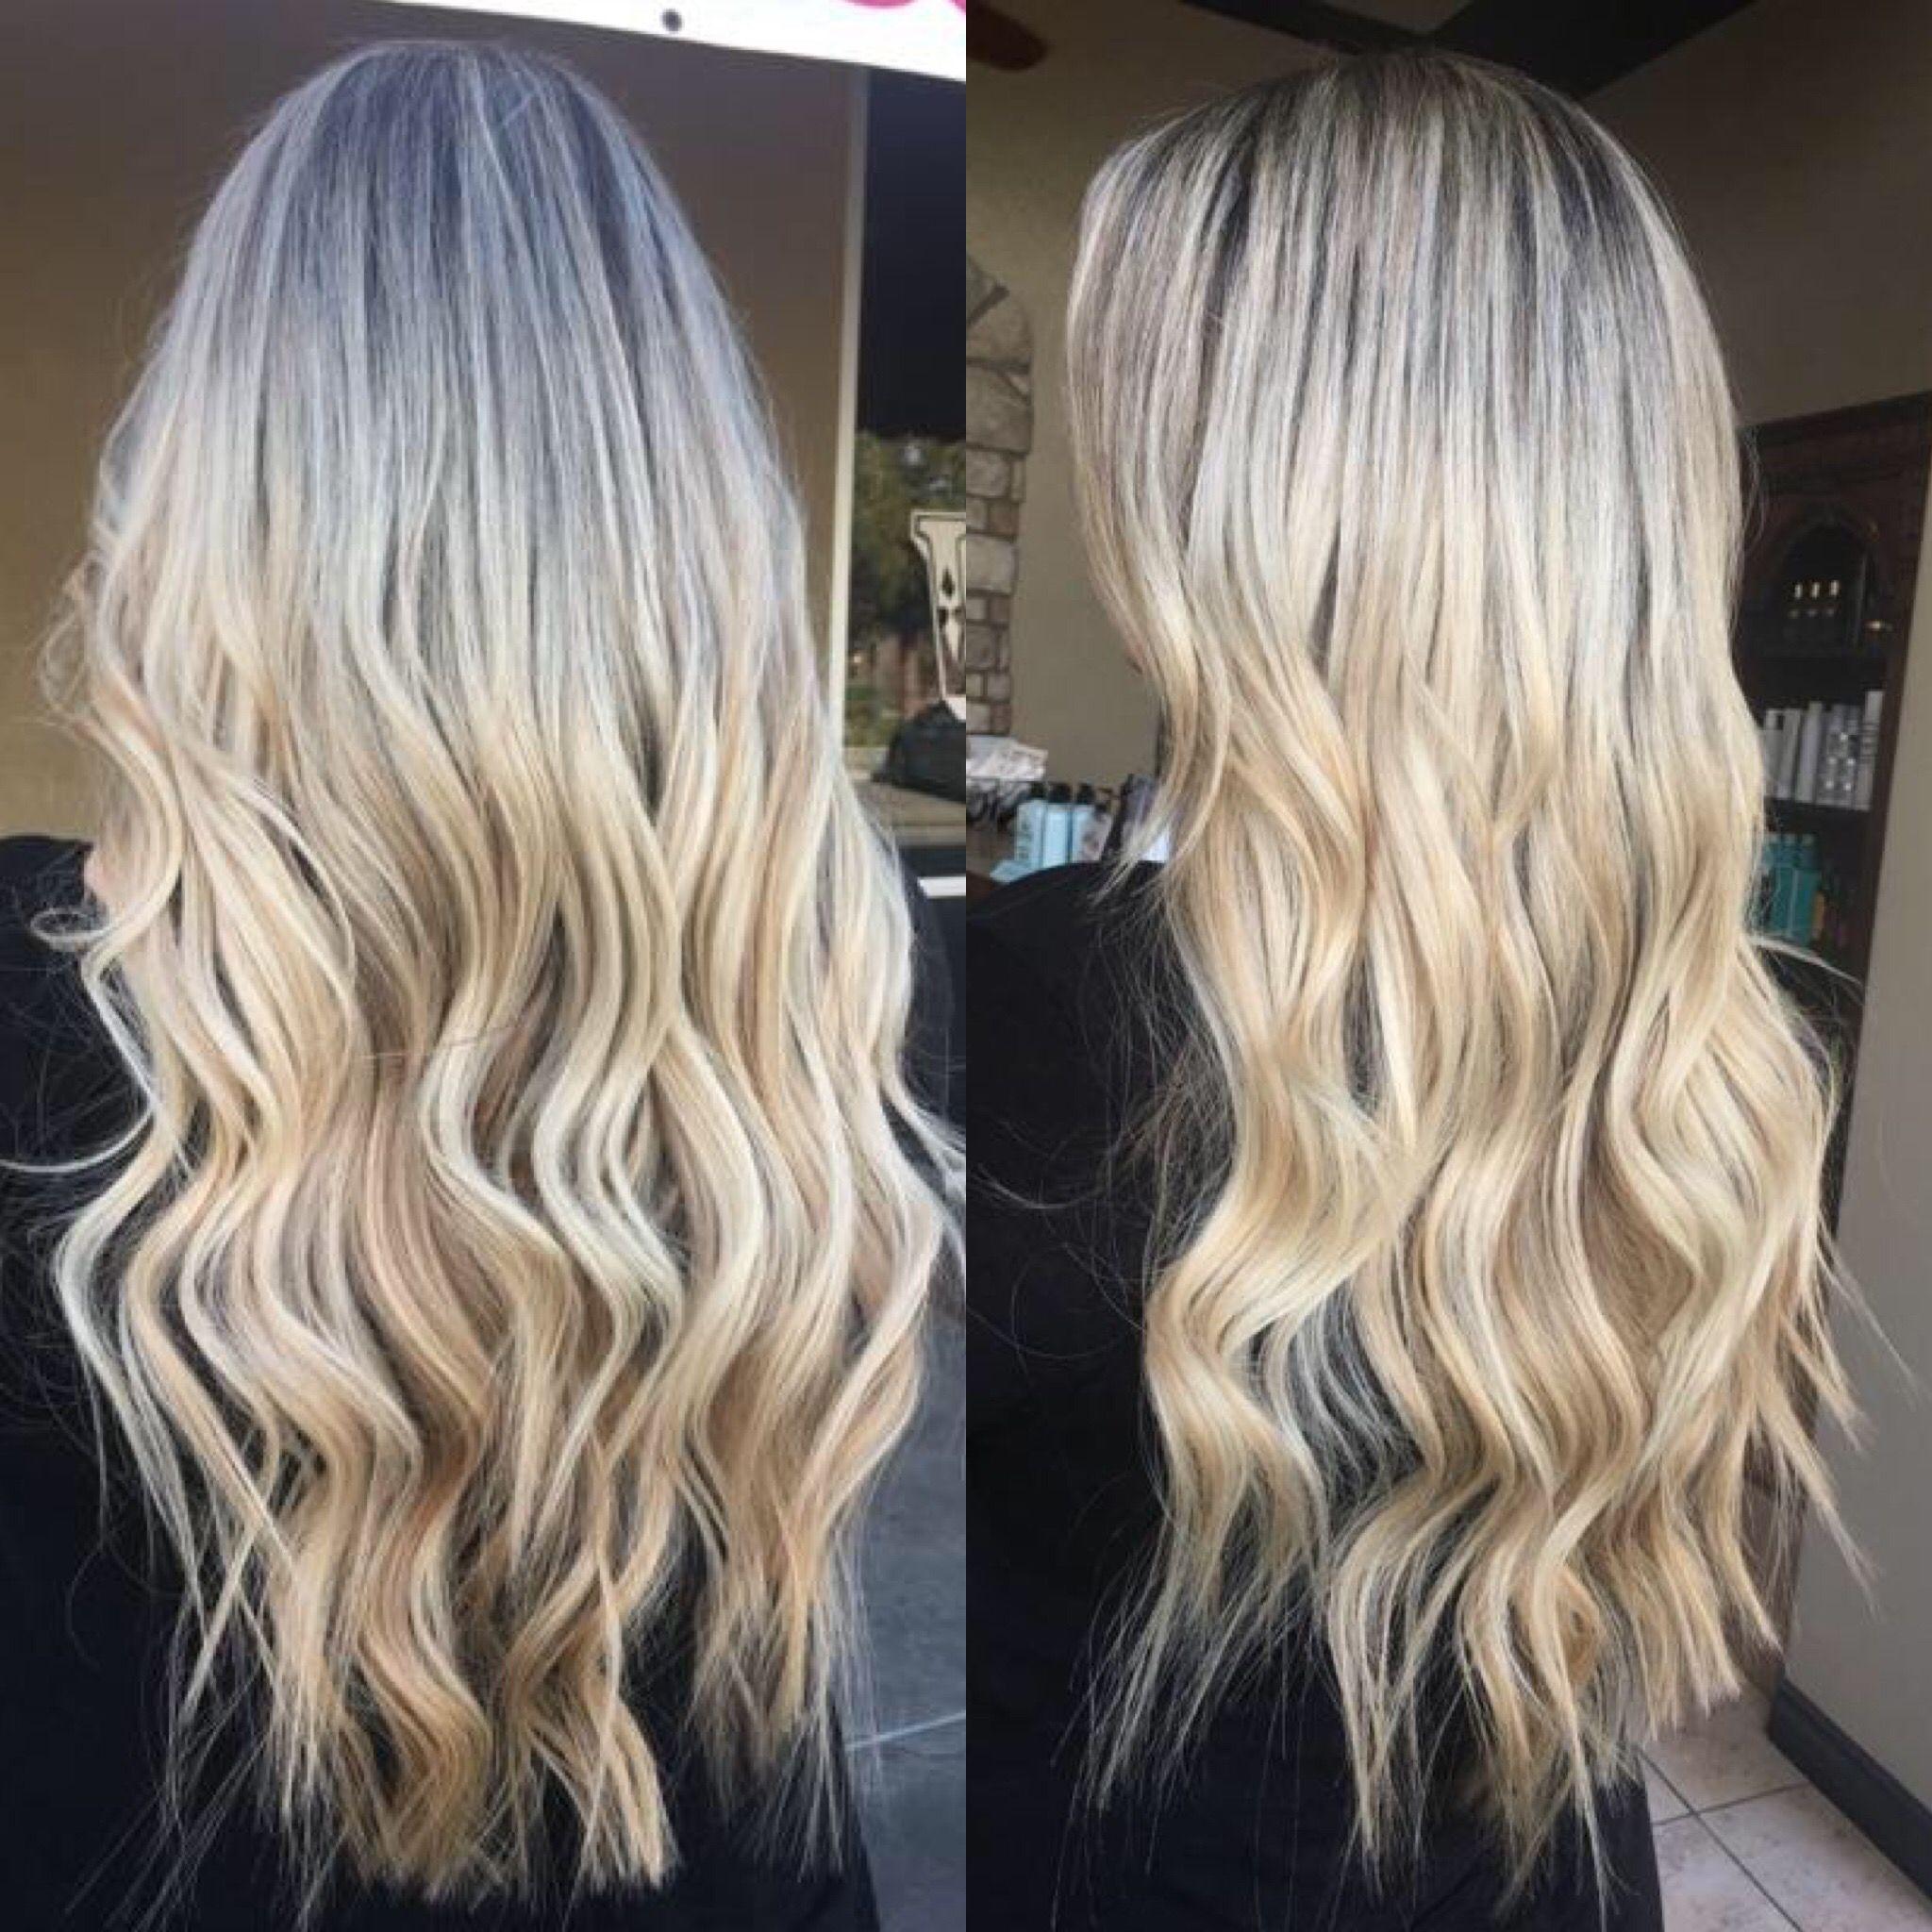 Long blonde hair extensions secret of medusa a passion of mine long blonde hair extensions secret of medusa pmusecretfo Gallery